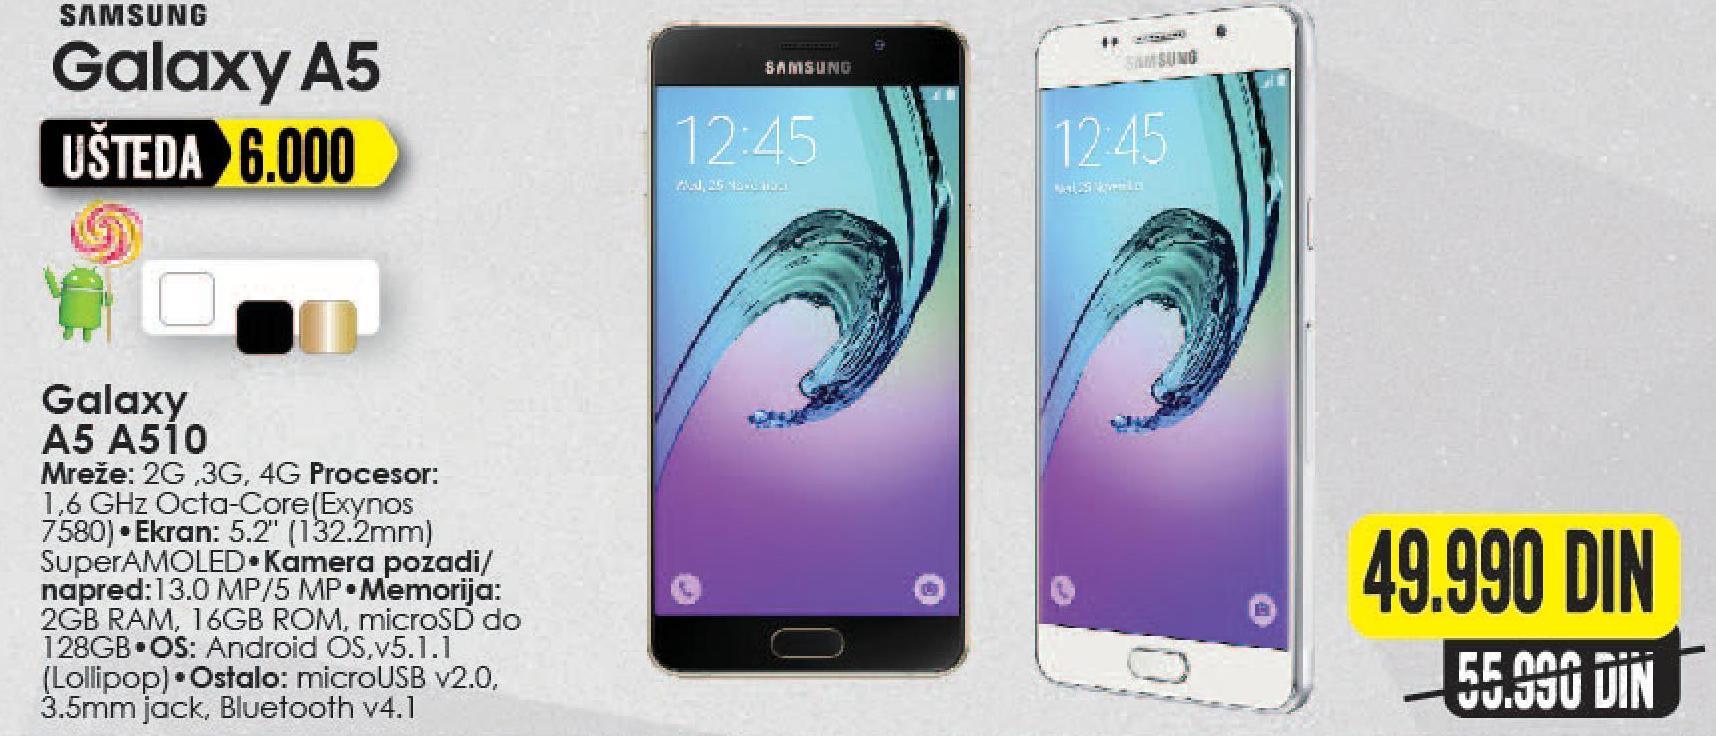 Mobilni telefon Galaxy A5 A510